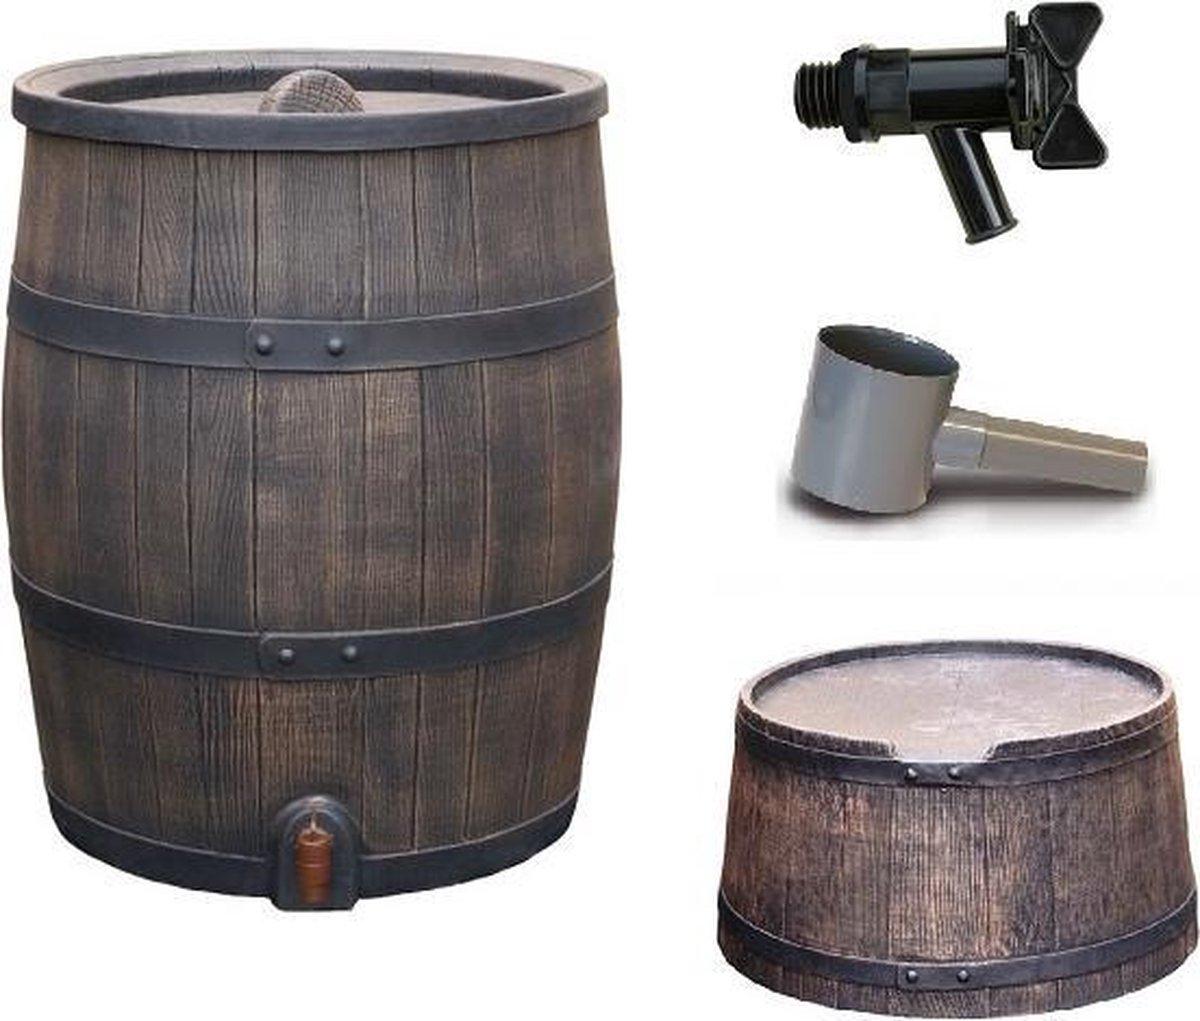 Regenton voordeelset | Roto 120 liter bruin + aftapkraan + standaard + vulautomaat 70/80mm.